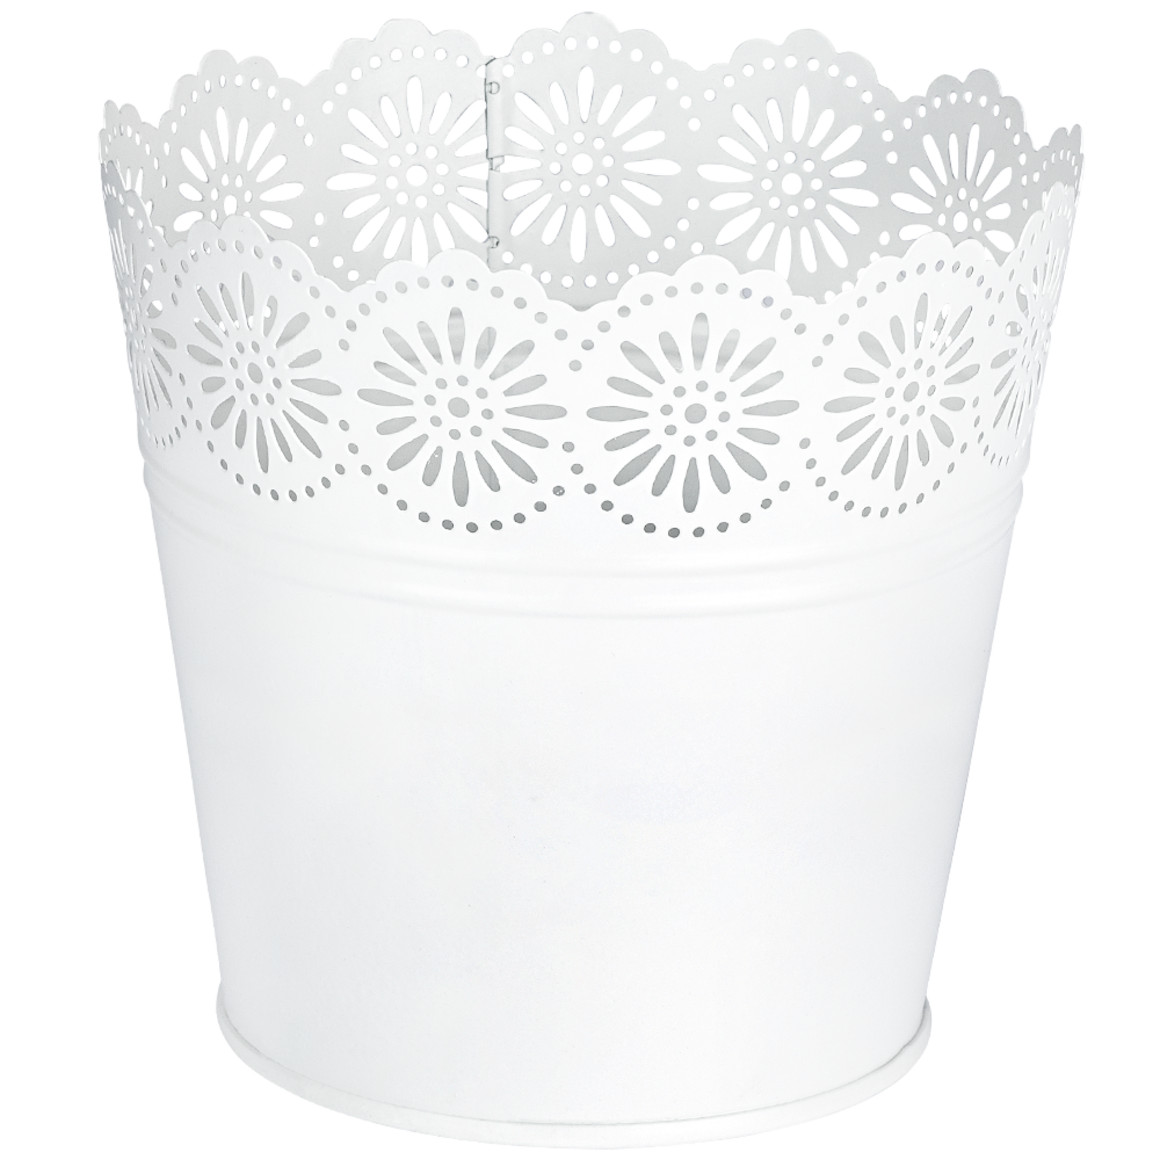 7 l Emsa MILANO Blumenkübel Pflanzkübel Blumentopf 28 cm Maße  ø 28 cm H 23 cm